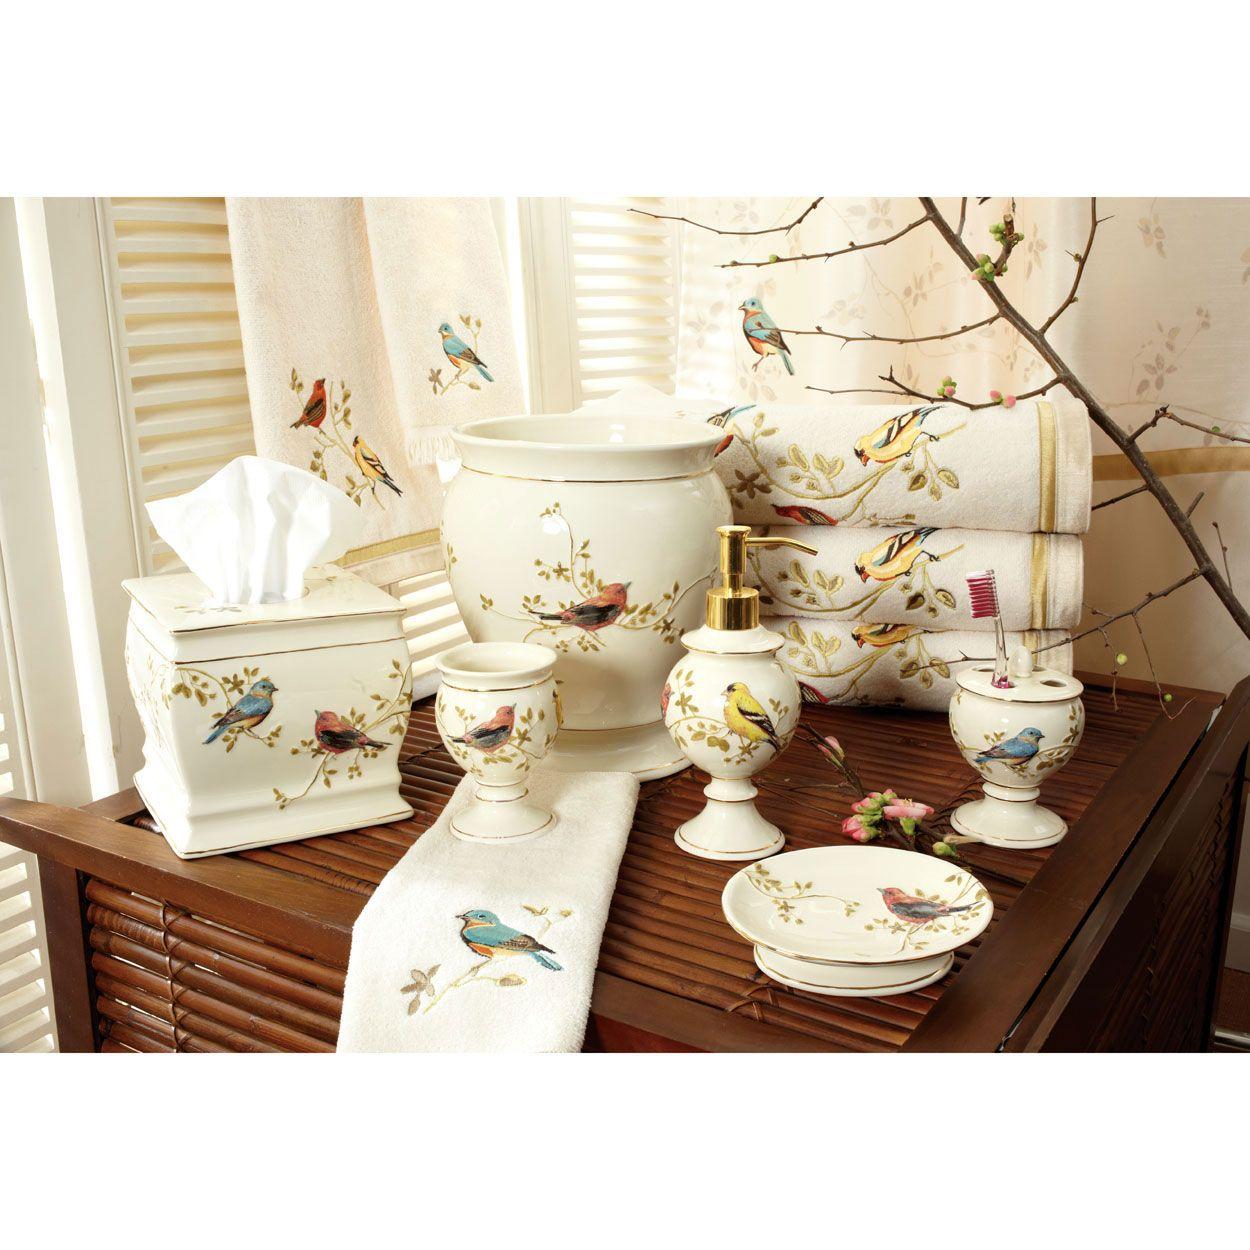 Gilded Birds Bath Accessories | Home Bathroom Decor/Organizing ...